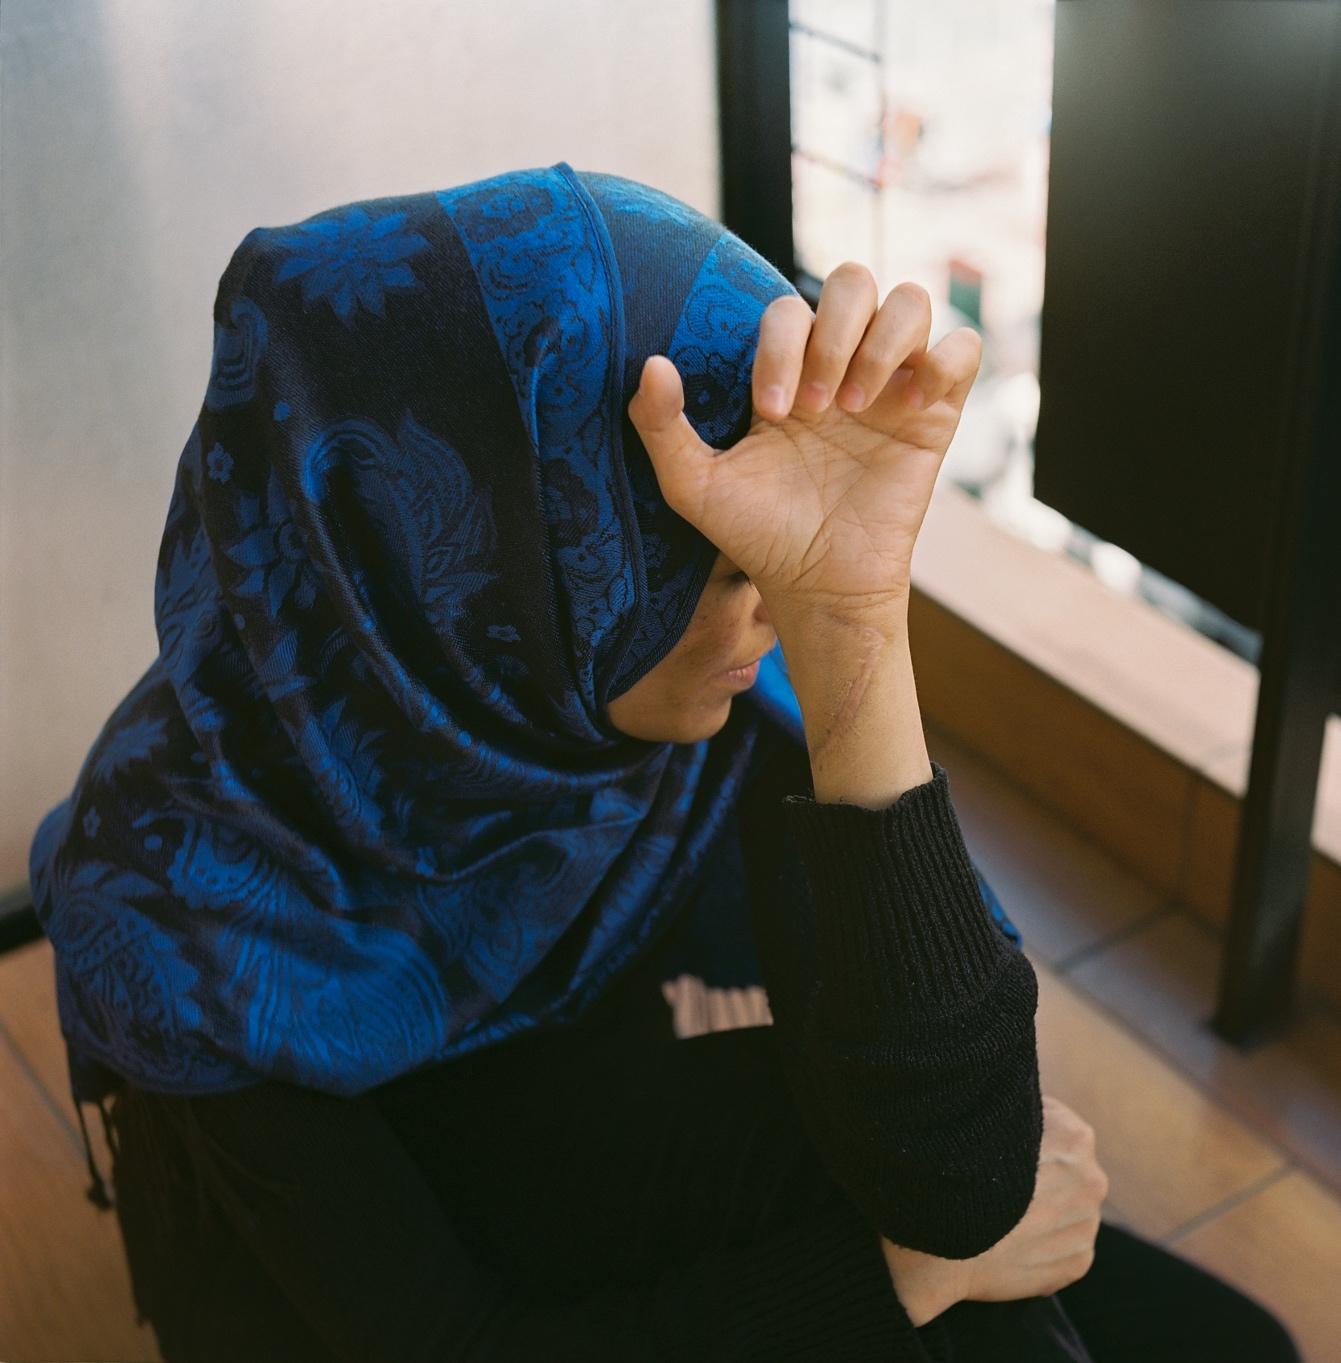 BOLD & BRAVE: TWO SYRIAN WOMEN SPEAK